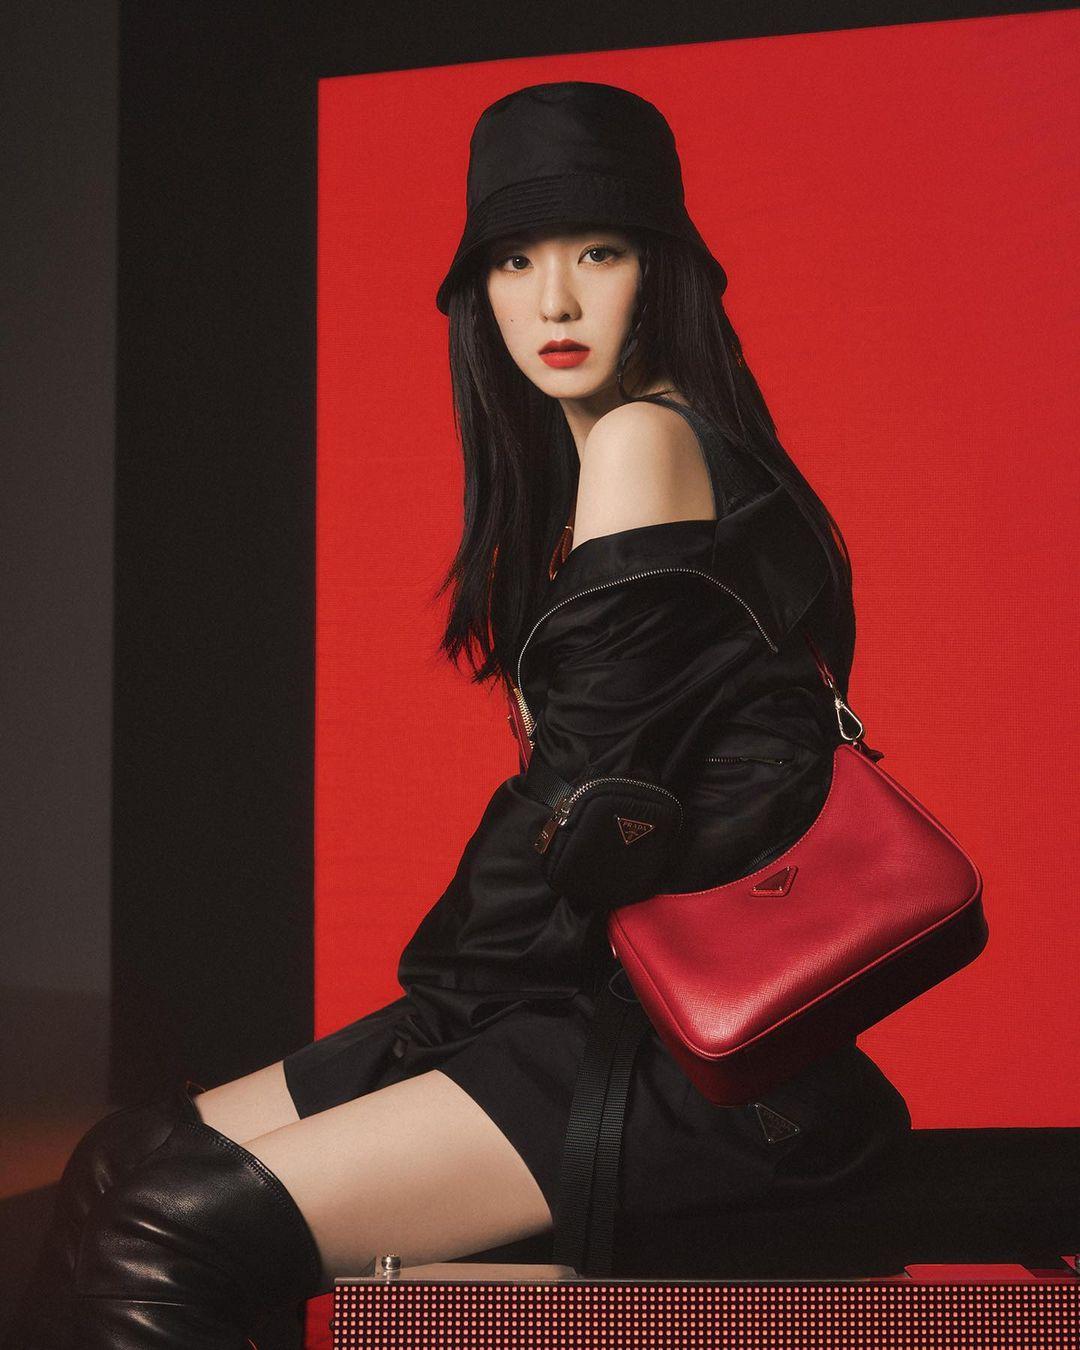 Irene fue acusada de mala actitud